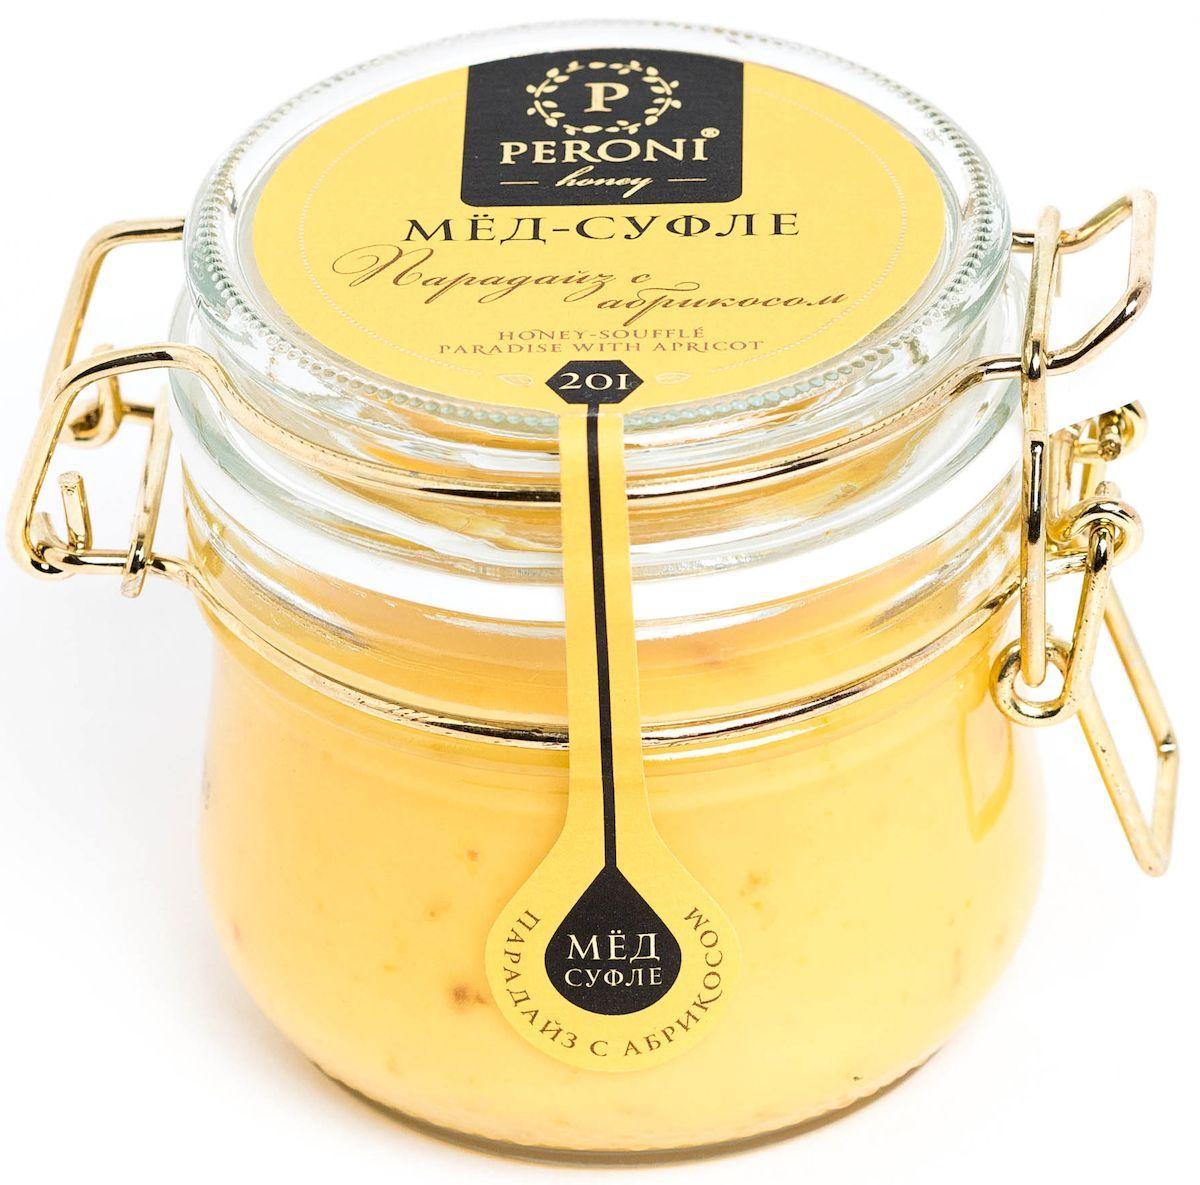 Peroni Парадайз с абрикосом мёд-суфле, 250 г peroni кедровый орешек мёд суфле 220 г